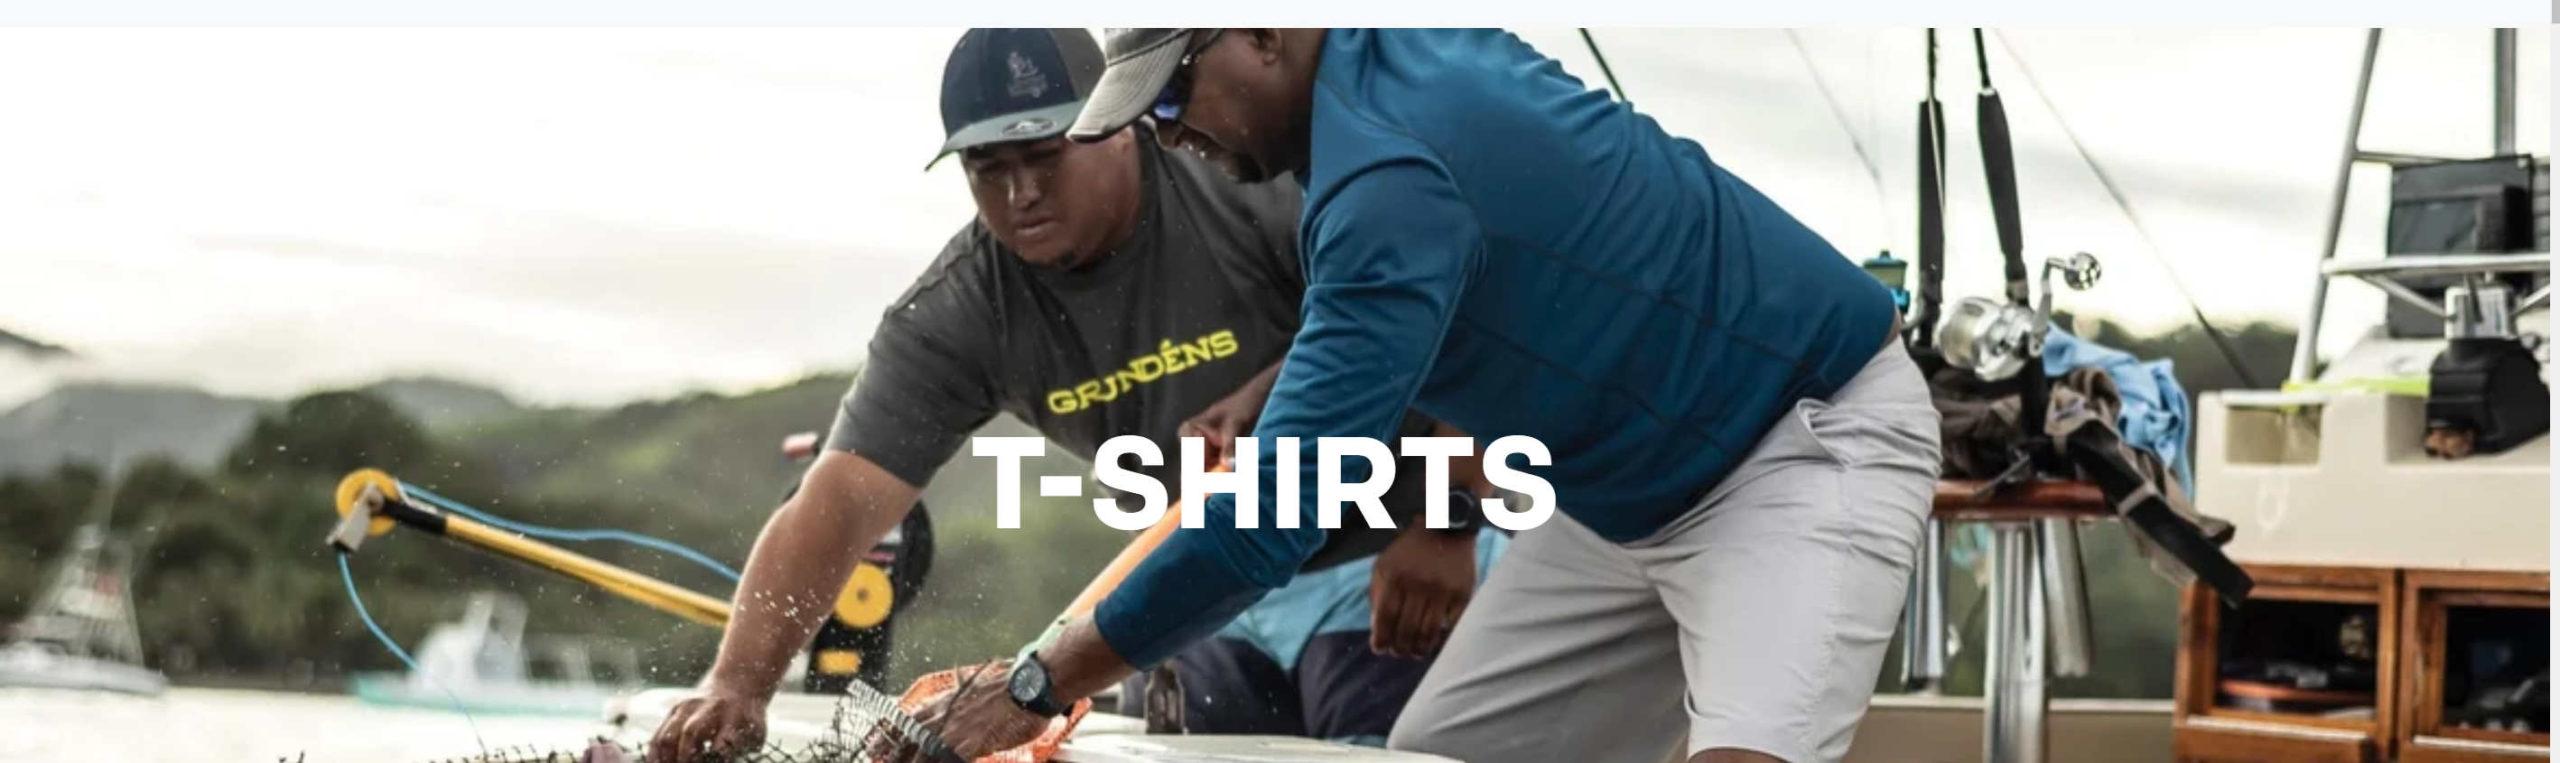 grundens tshirts